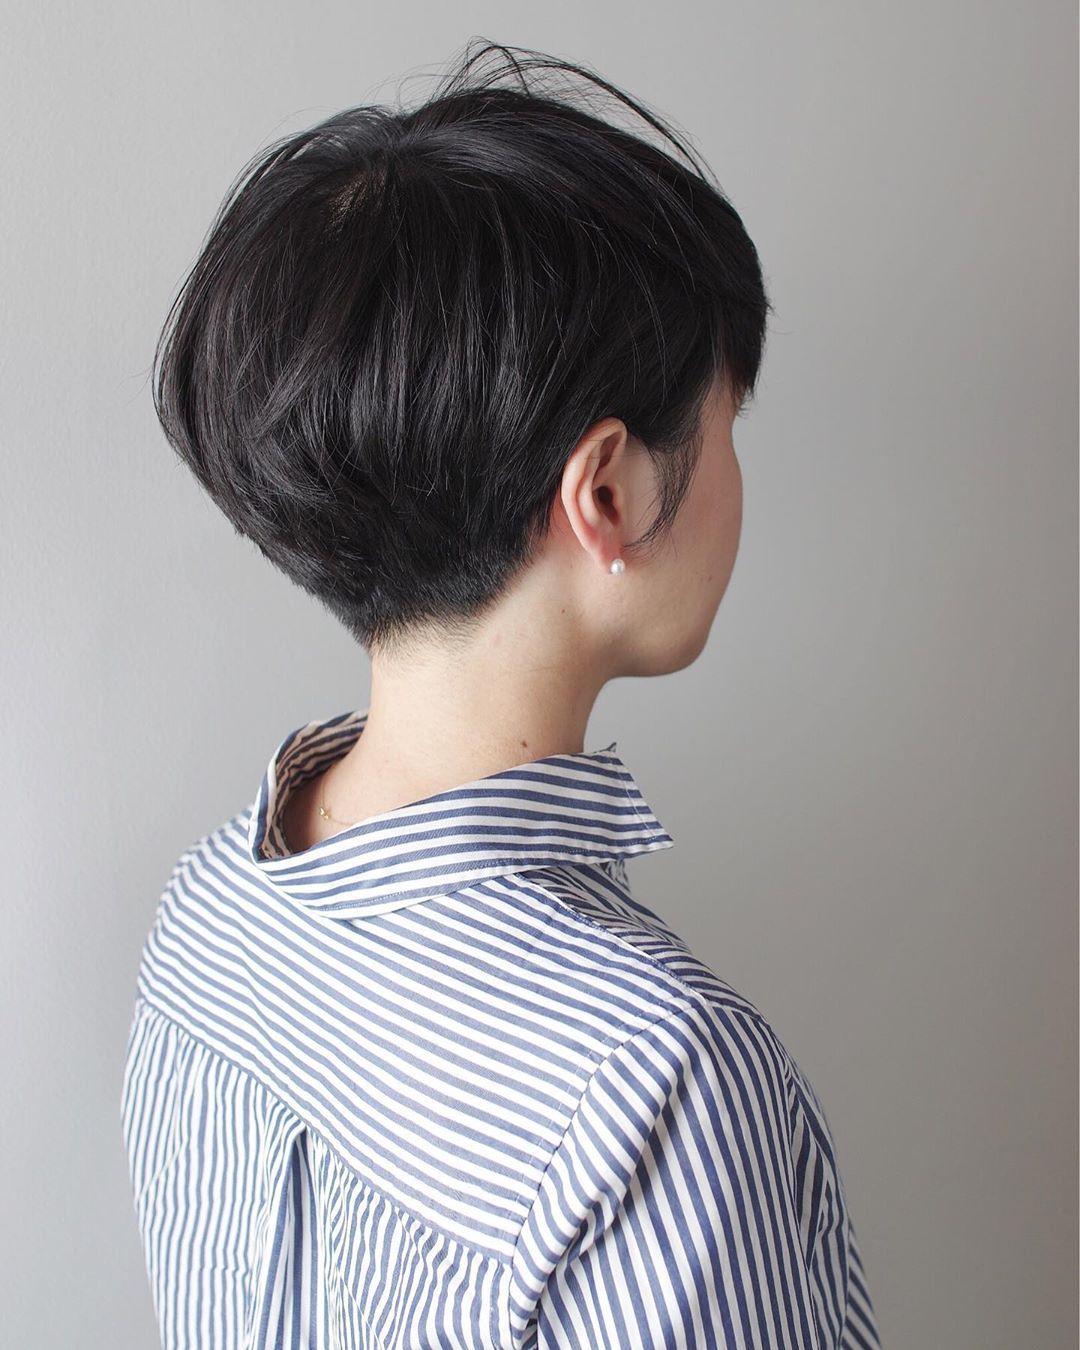 Hikaru Haraはinstagramを利用しています 刈り上げマッシュ 頭の形